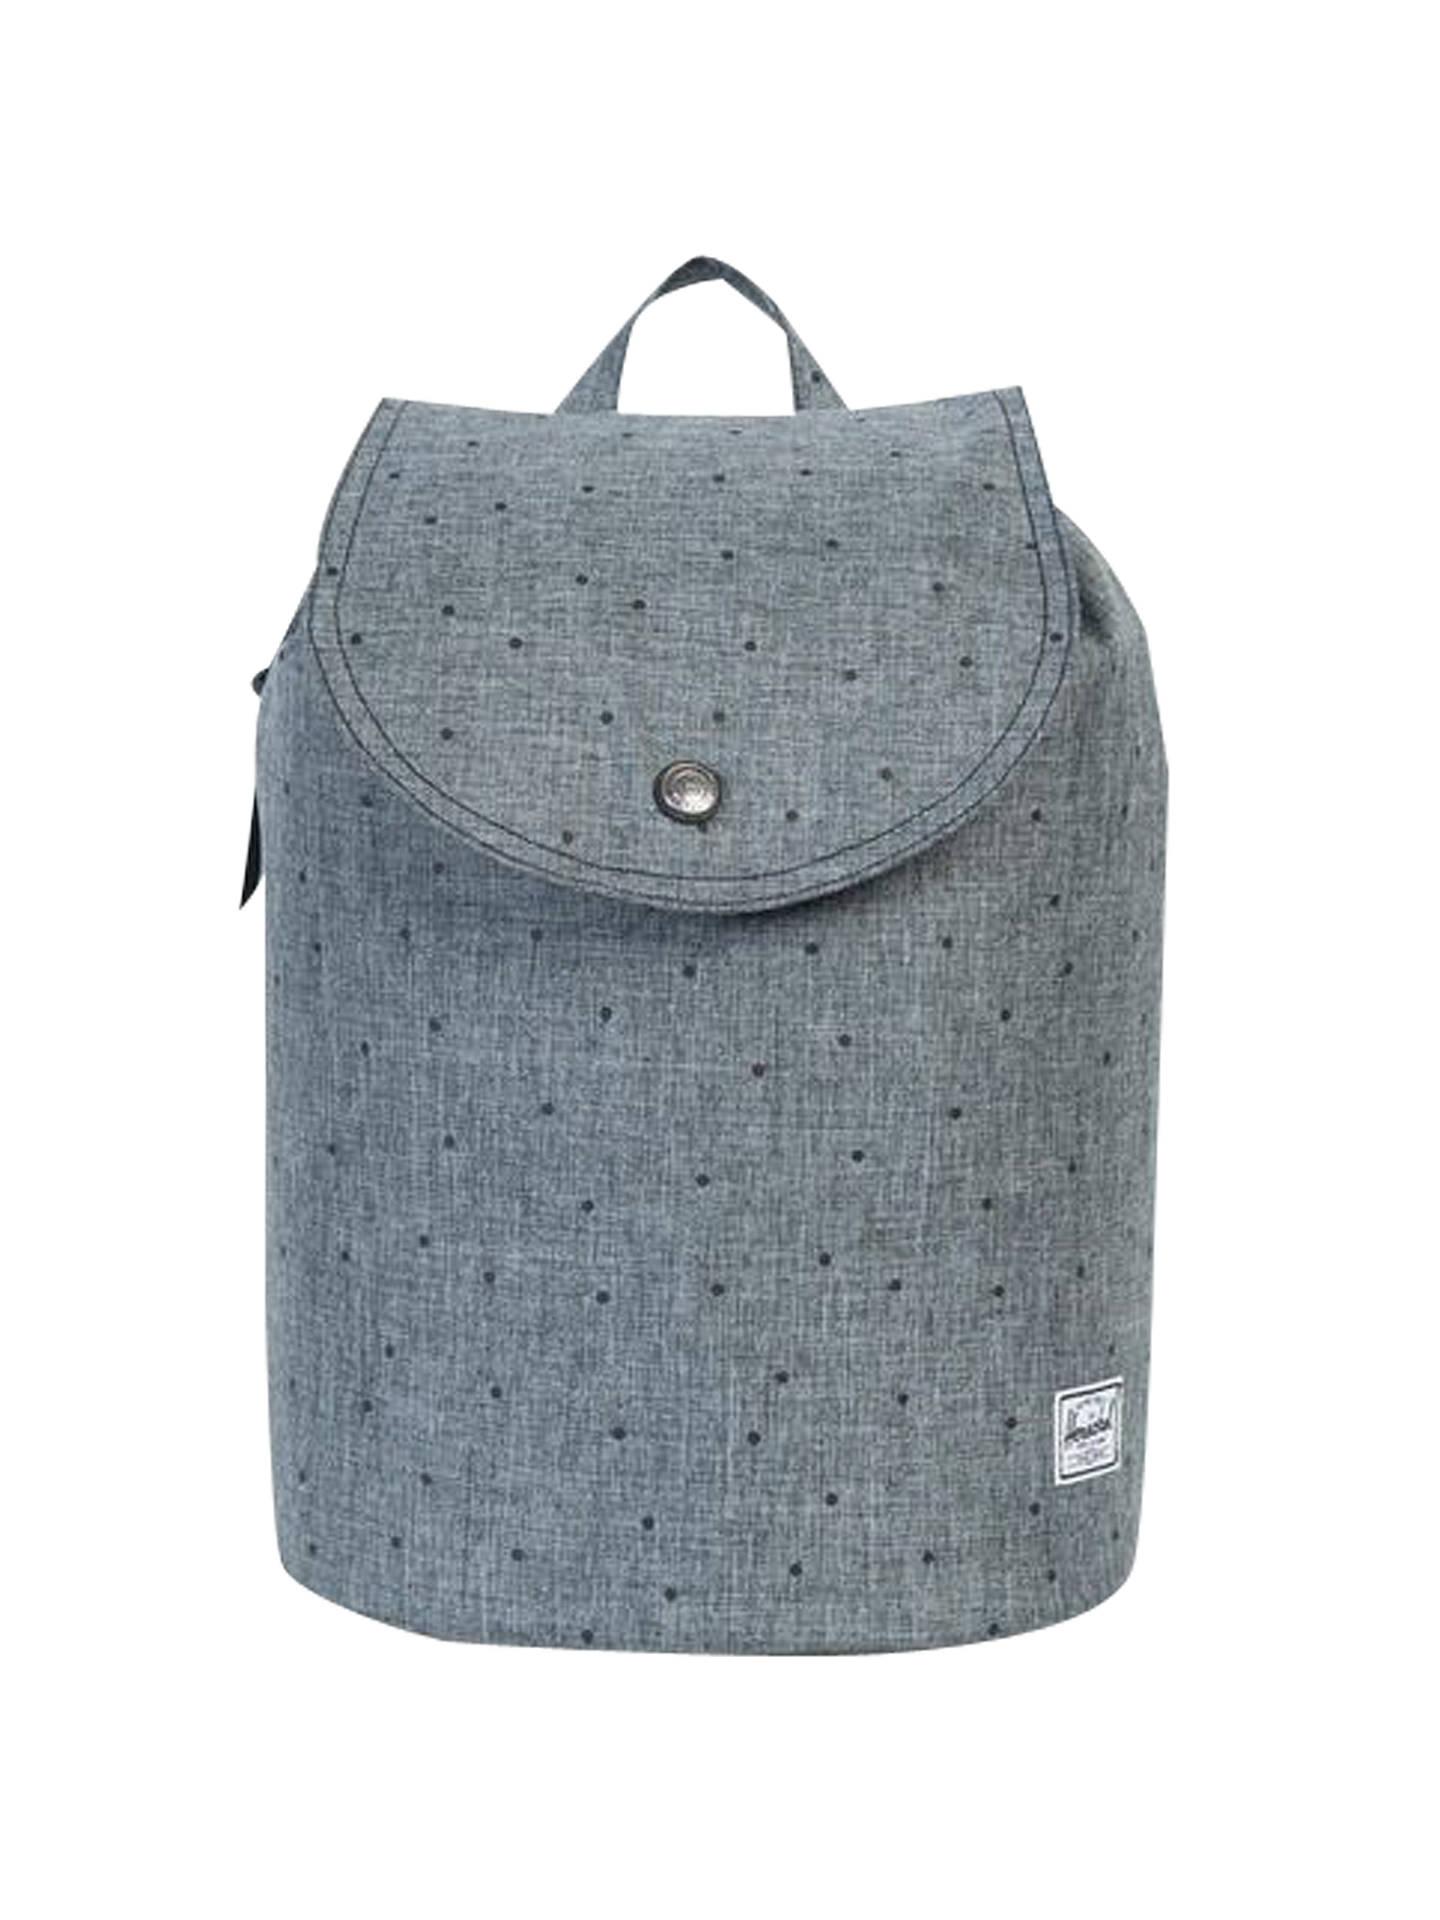 a2a0664212c BuyHerschel Supply Co. Reid Backpack